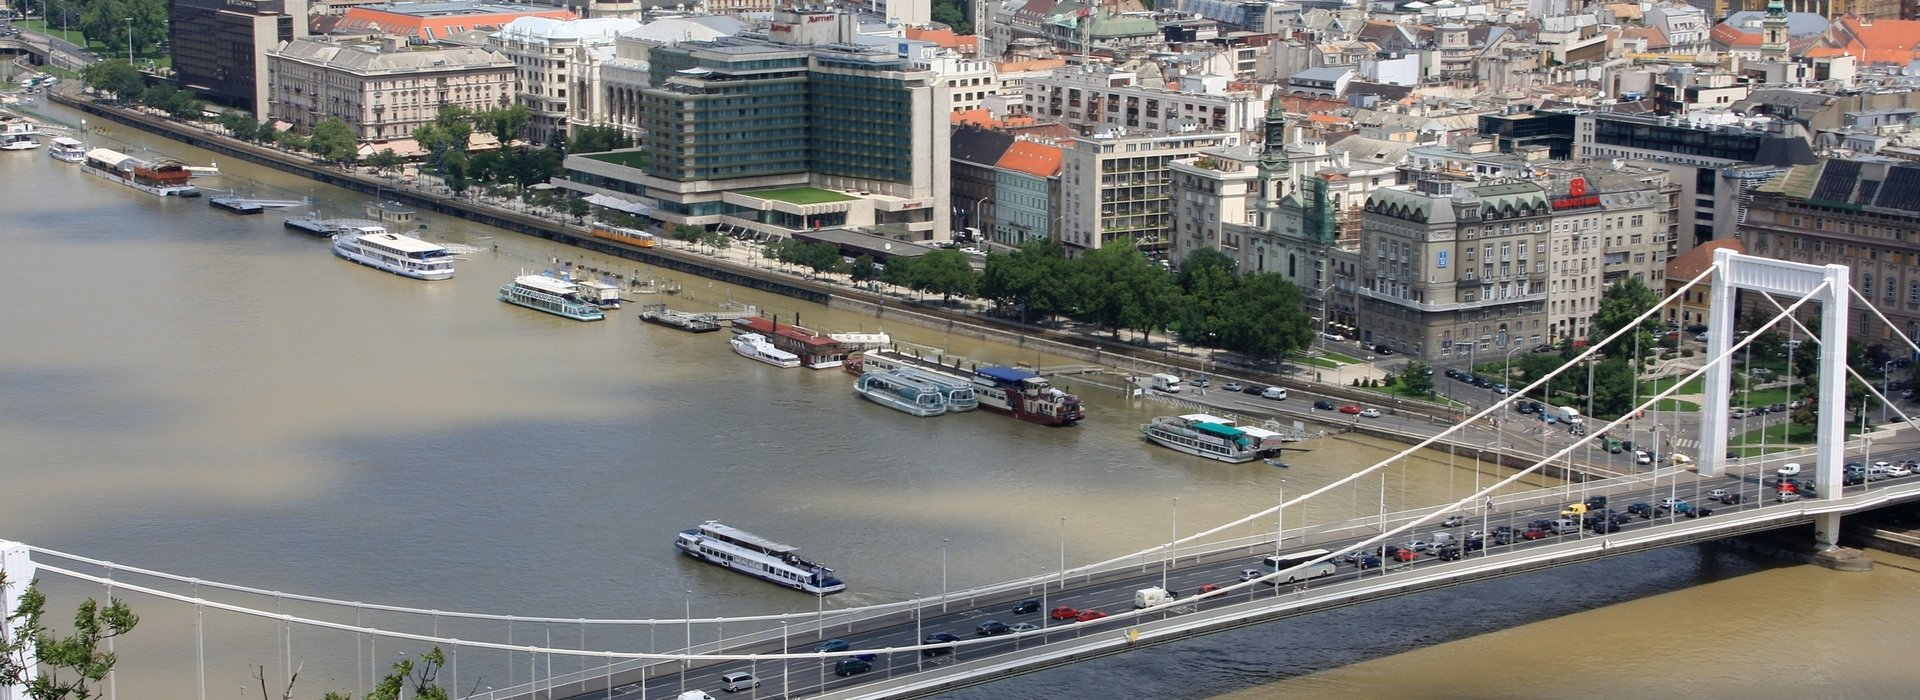 Rákóczi Brücke